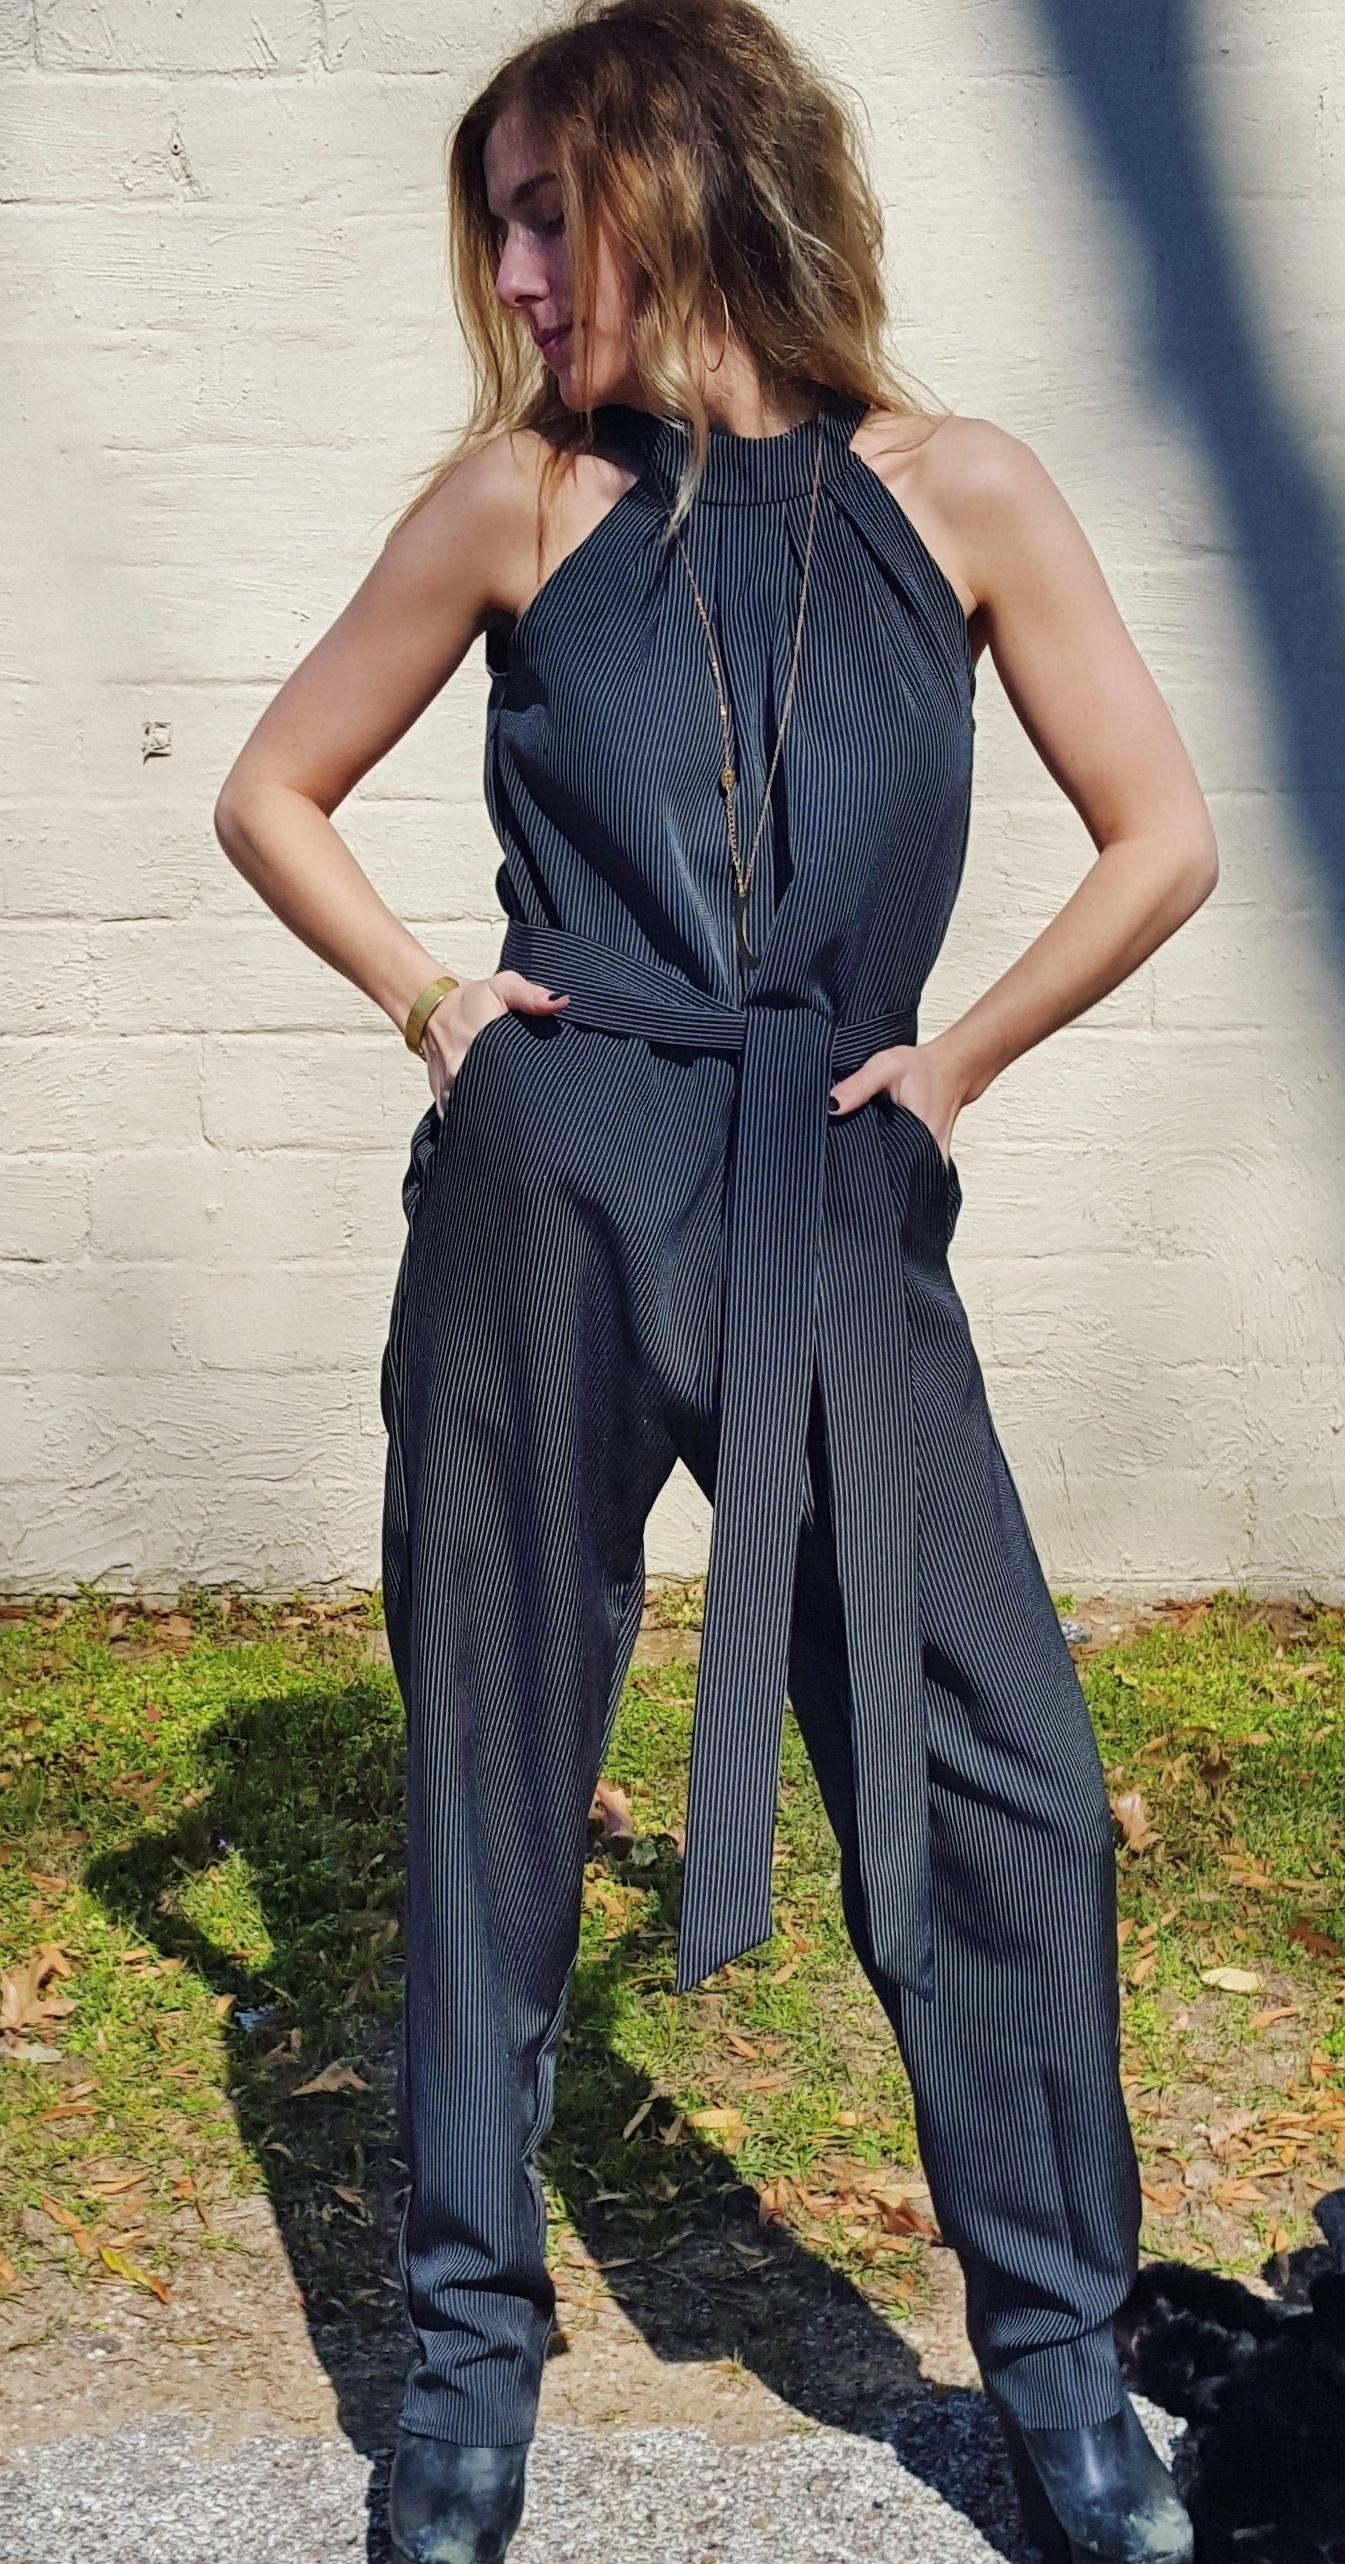 Amazing Menswear Inspired Black Pinstripe Jumpsuit Open Back Shown